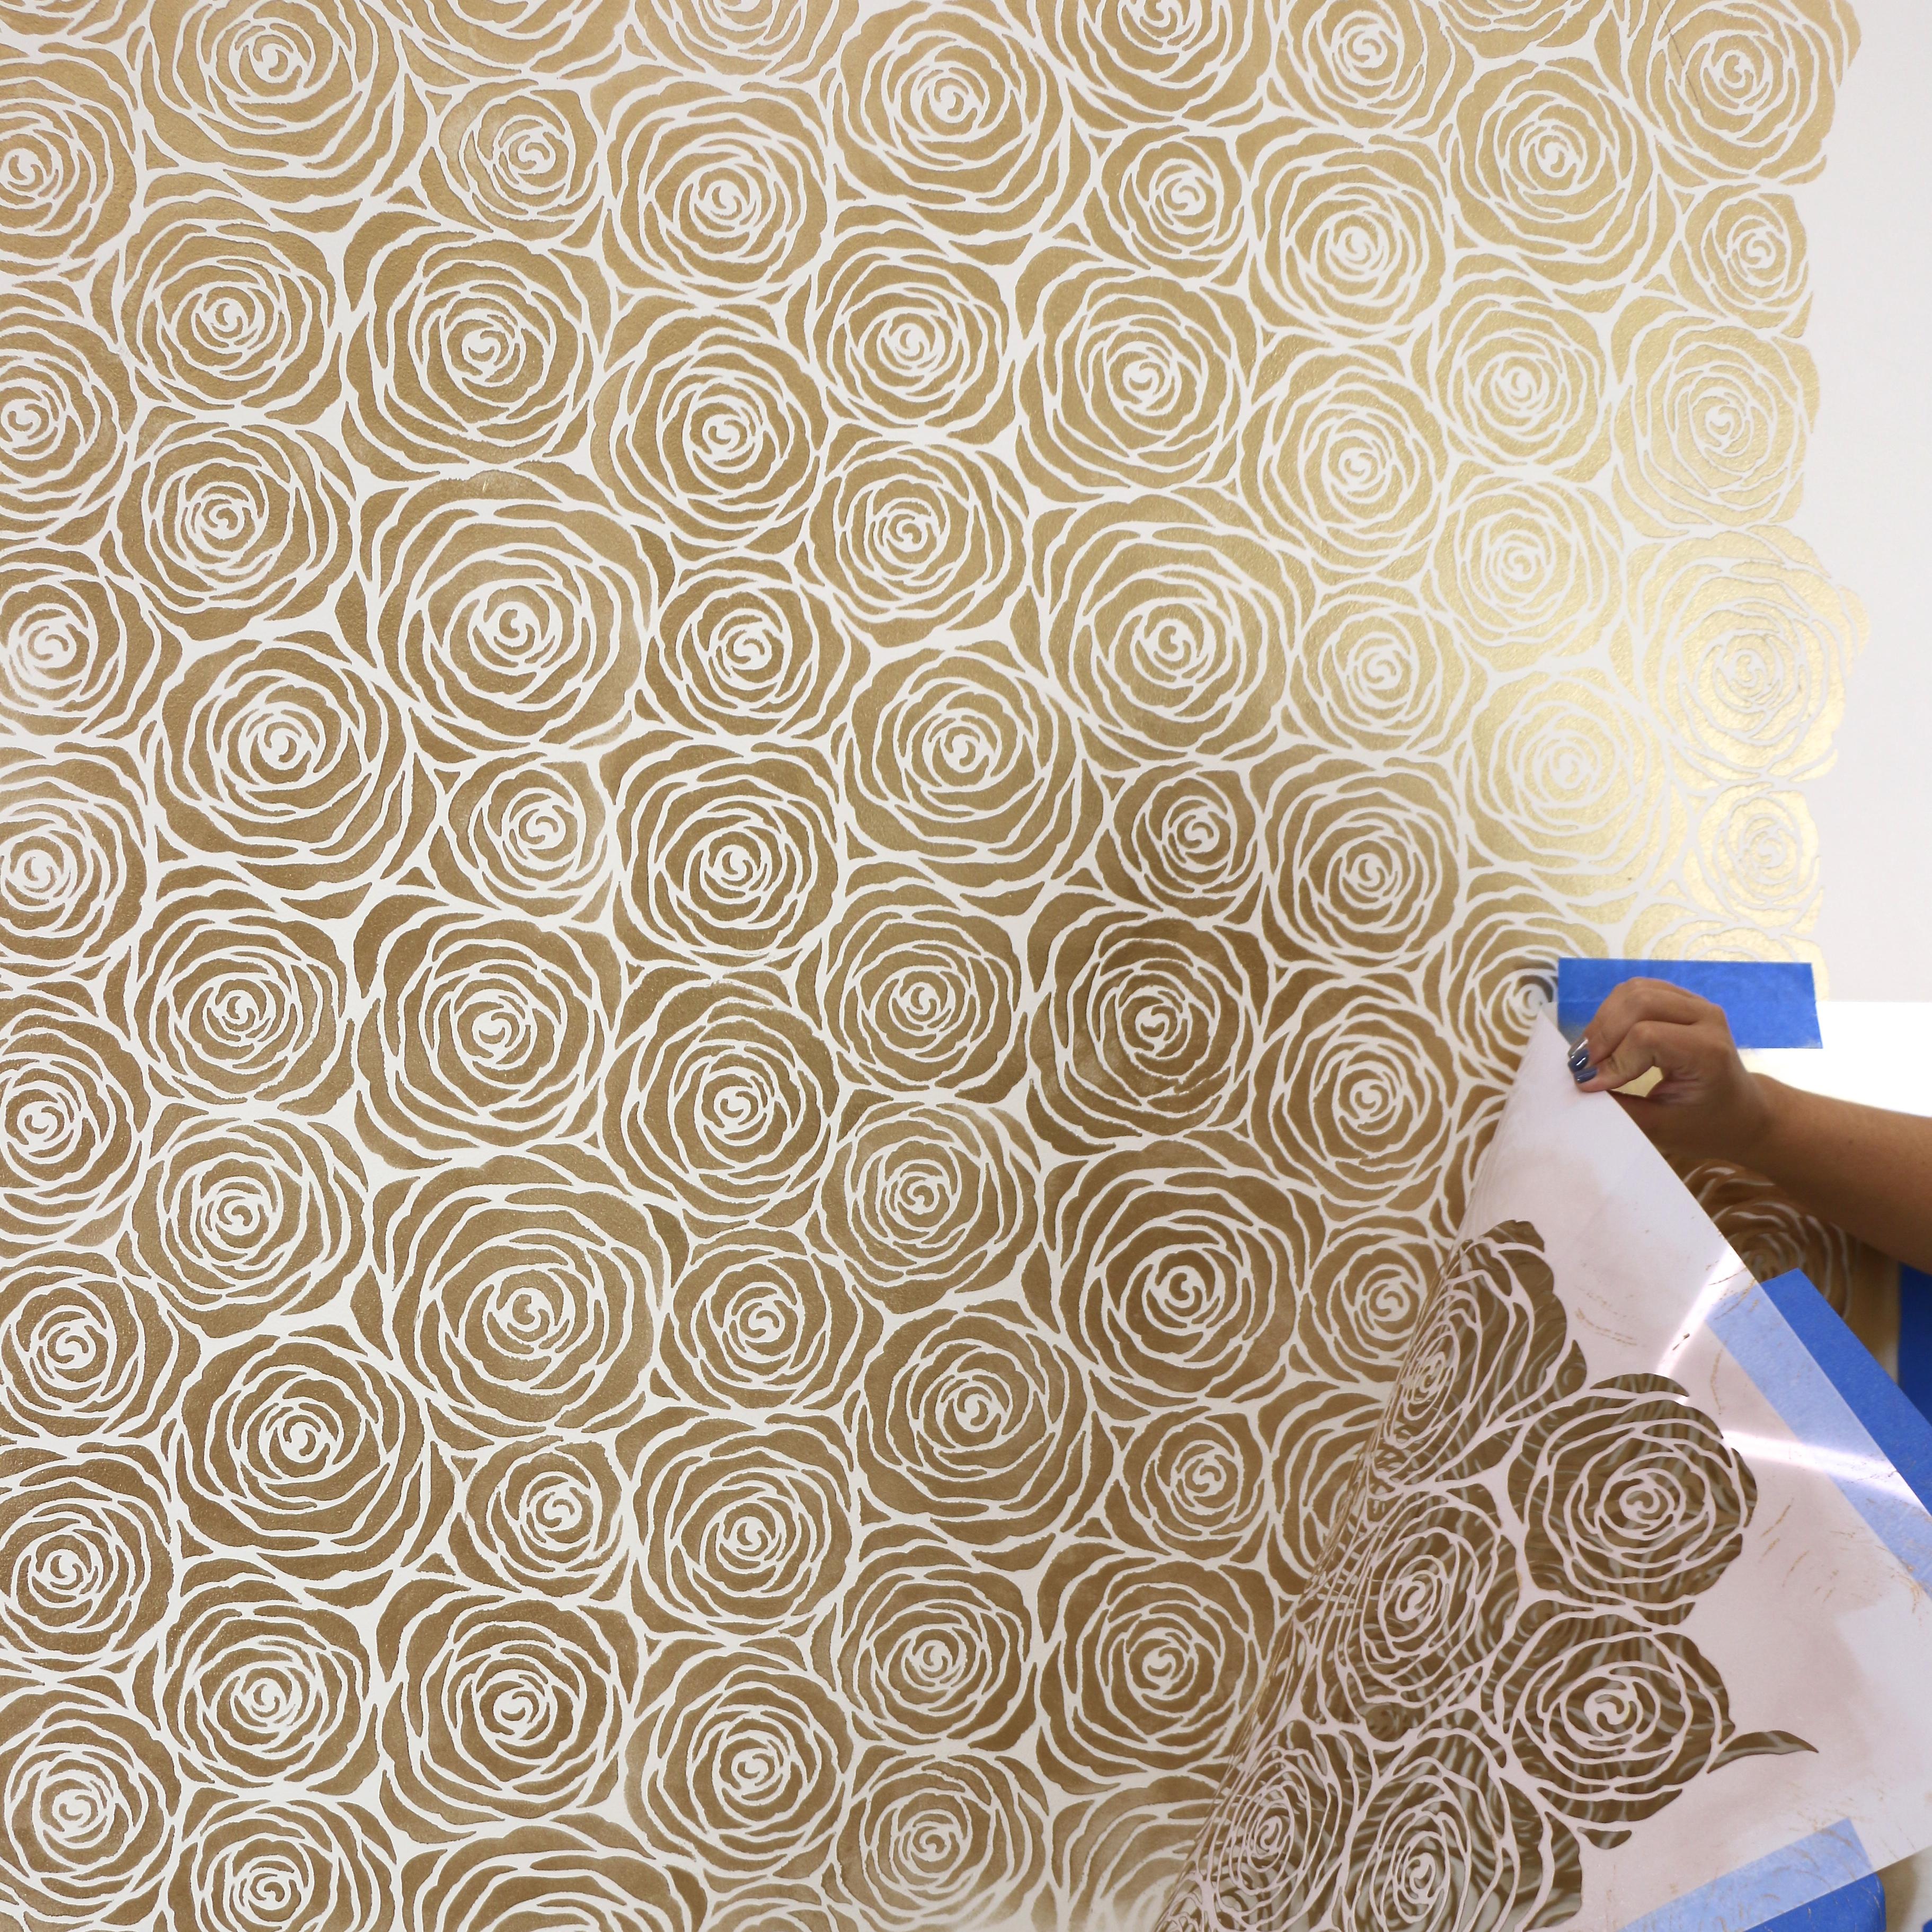 Roll metallic paint over wall stencil